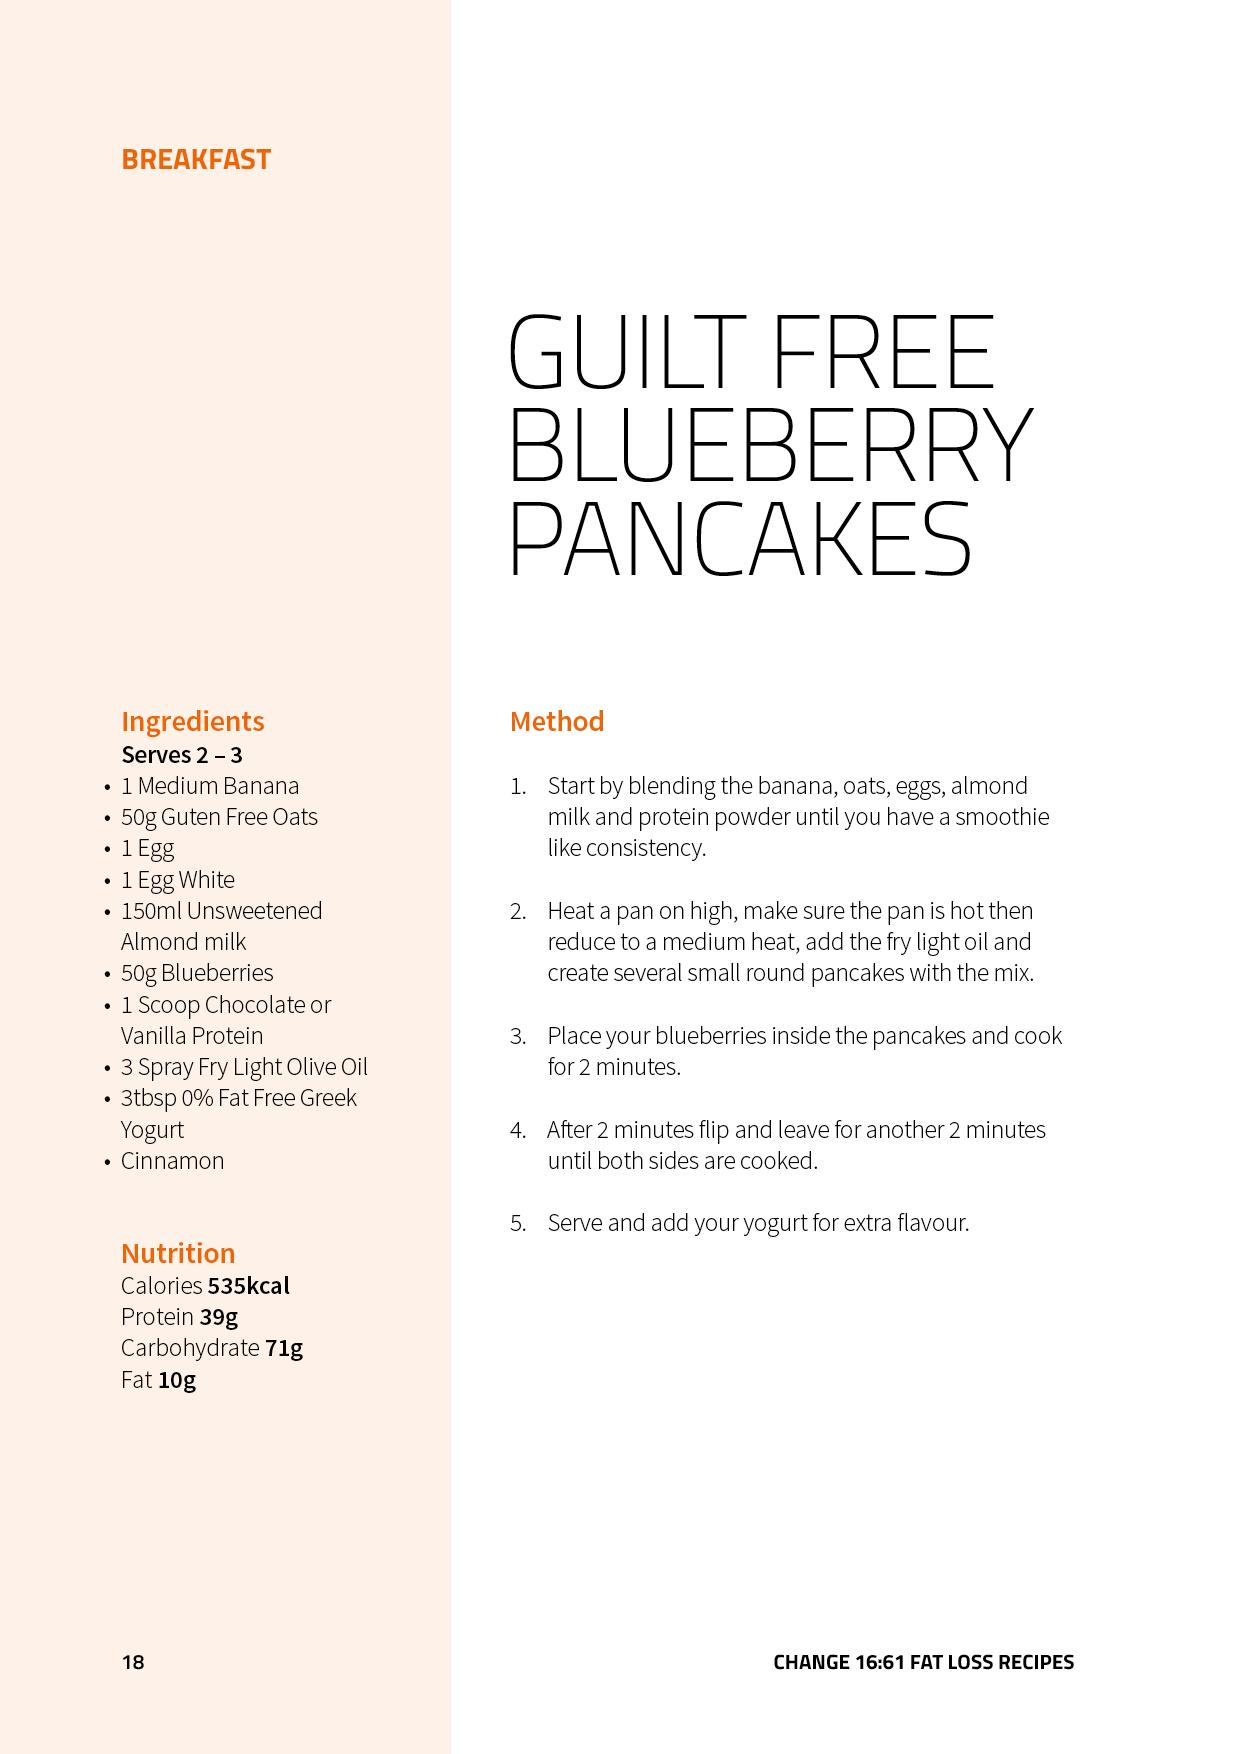 Change 16-61 Fat Loss Recipe Book3.jpg